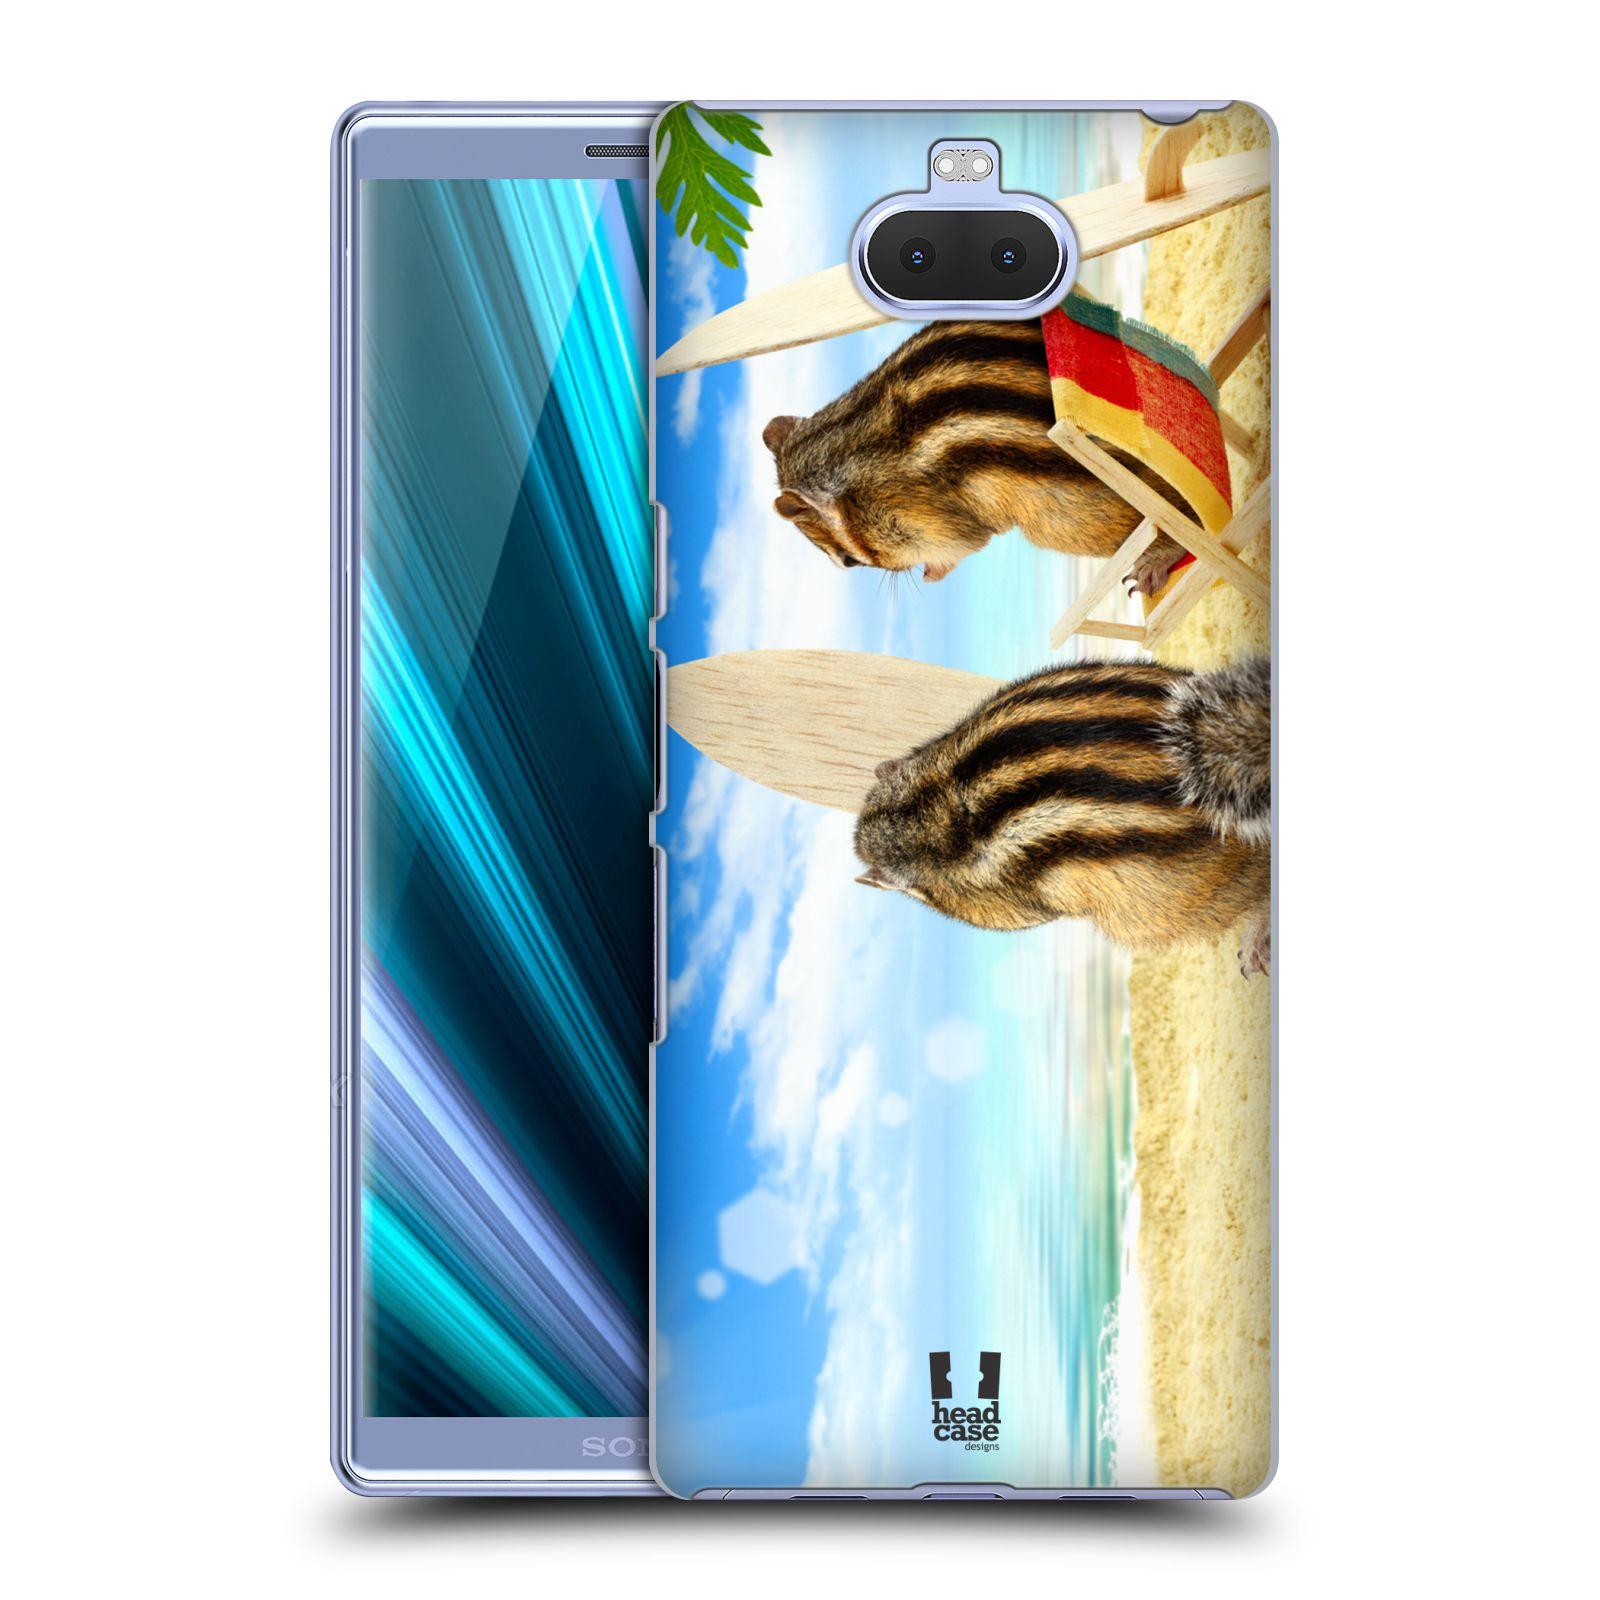 Pouzdro na mobil Sony Xperia 10 - Head Case - vzor Legrační zvířátka veverky surfaři u moře